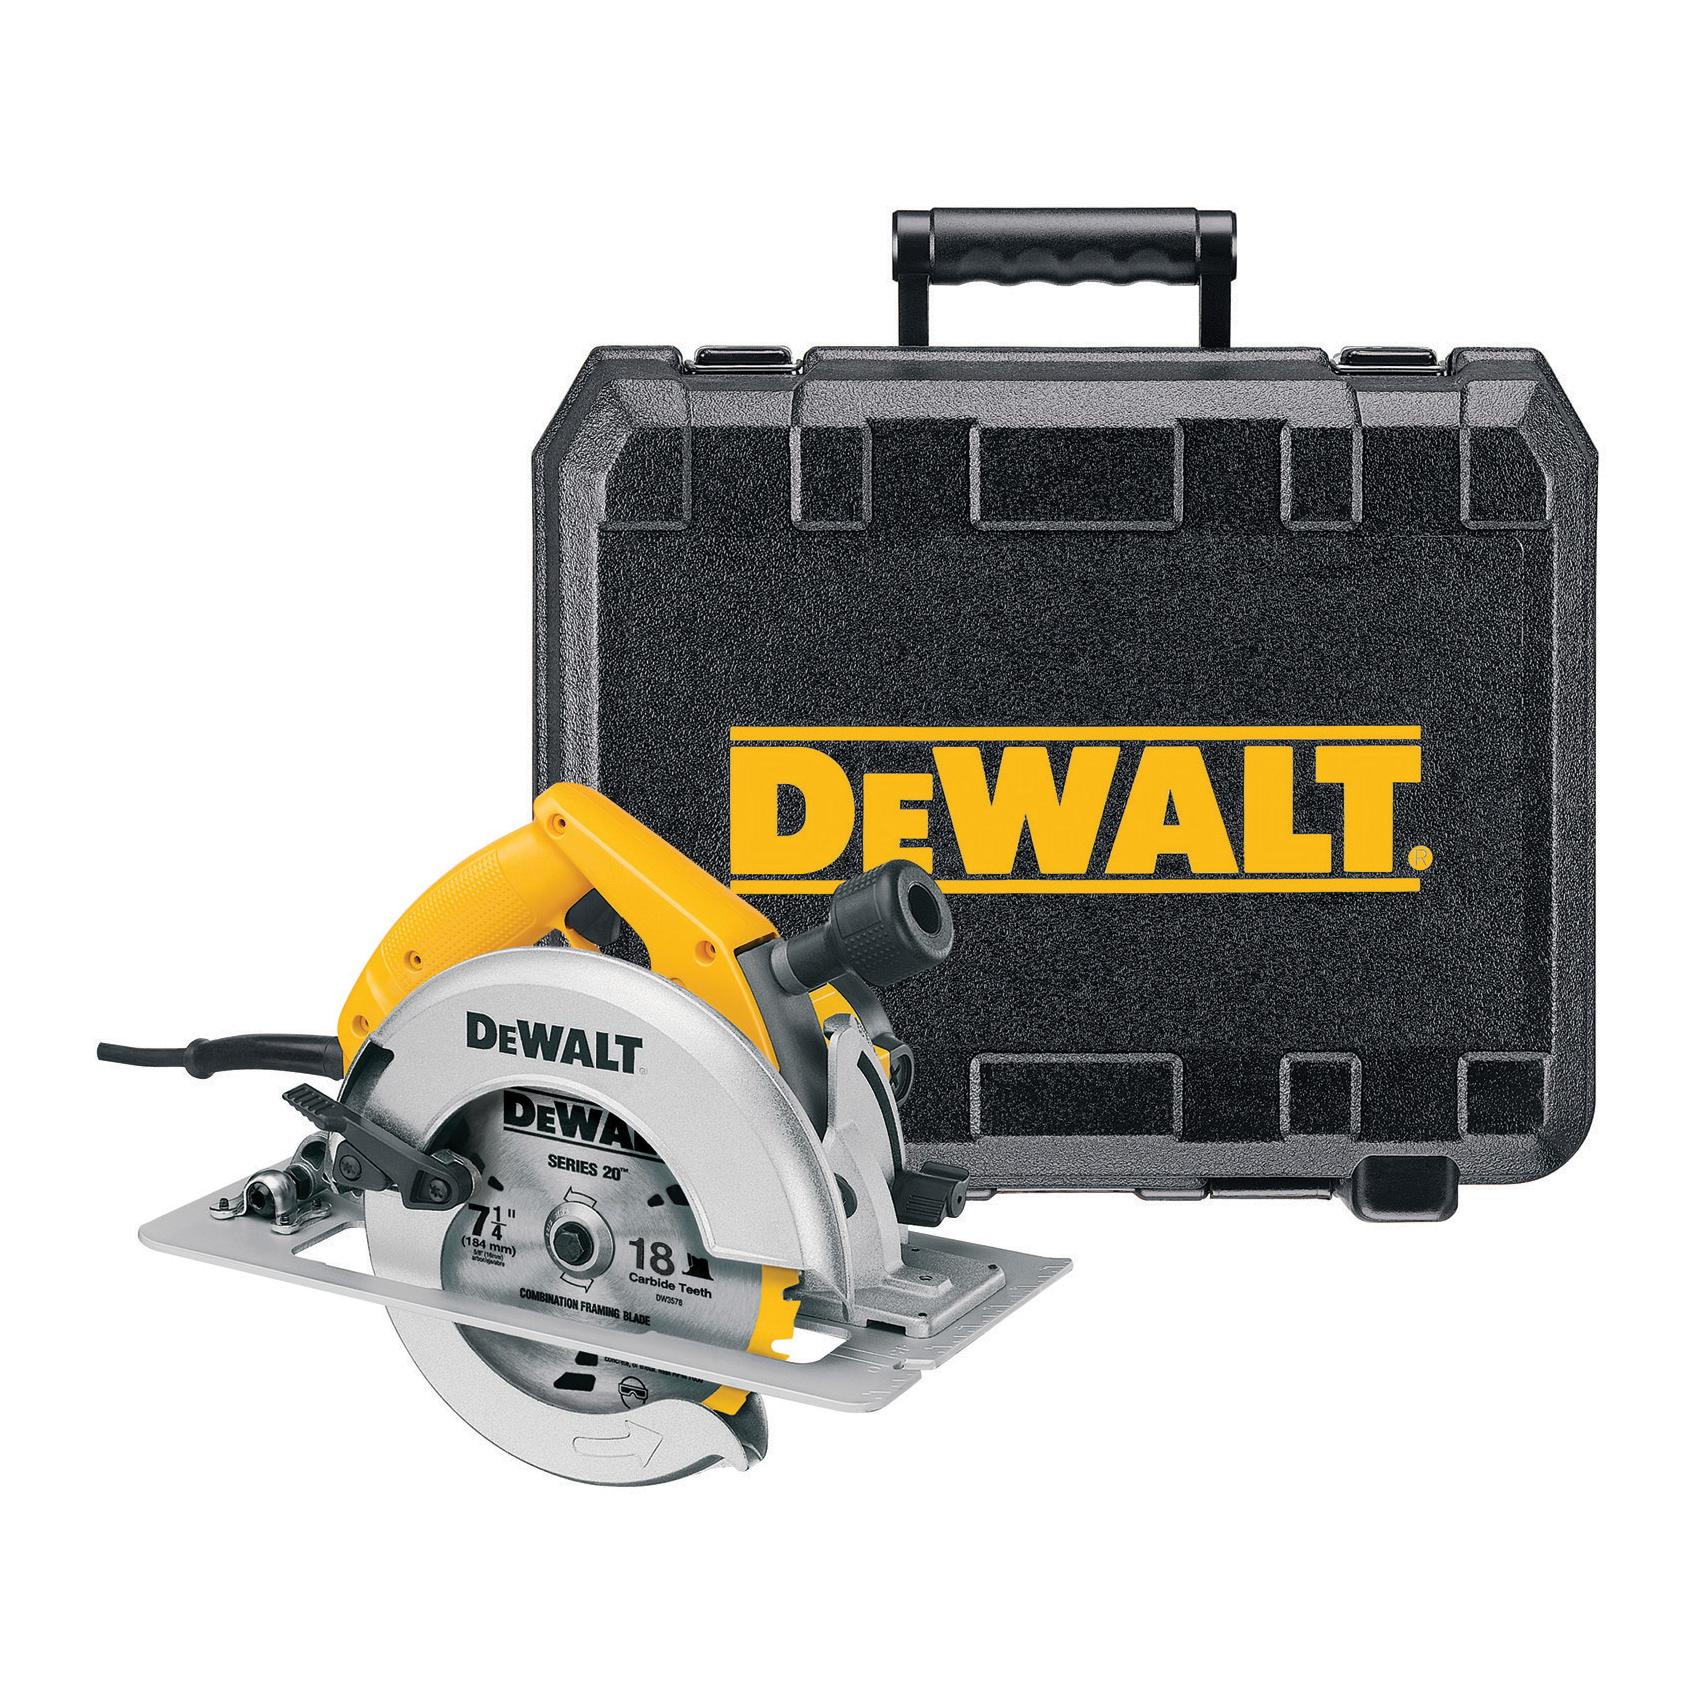 DeWALT® DW364K Circular Saw Kit, 7-1/4 in Dia Blade, 5/8 in Arbor/Shank, 1-7/8 in at 45 deg, 2-7/16 in at 90 deg Cutting, Right Blade Side